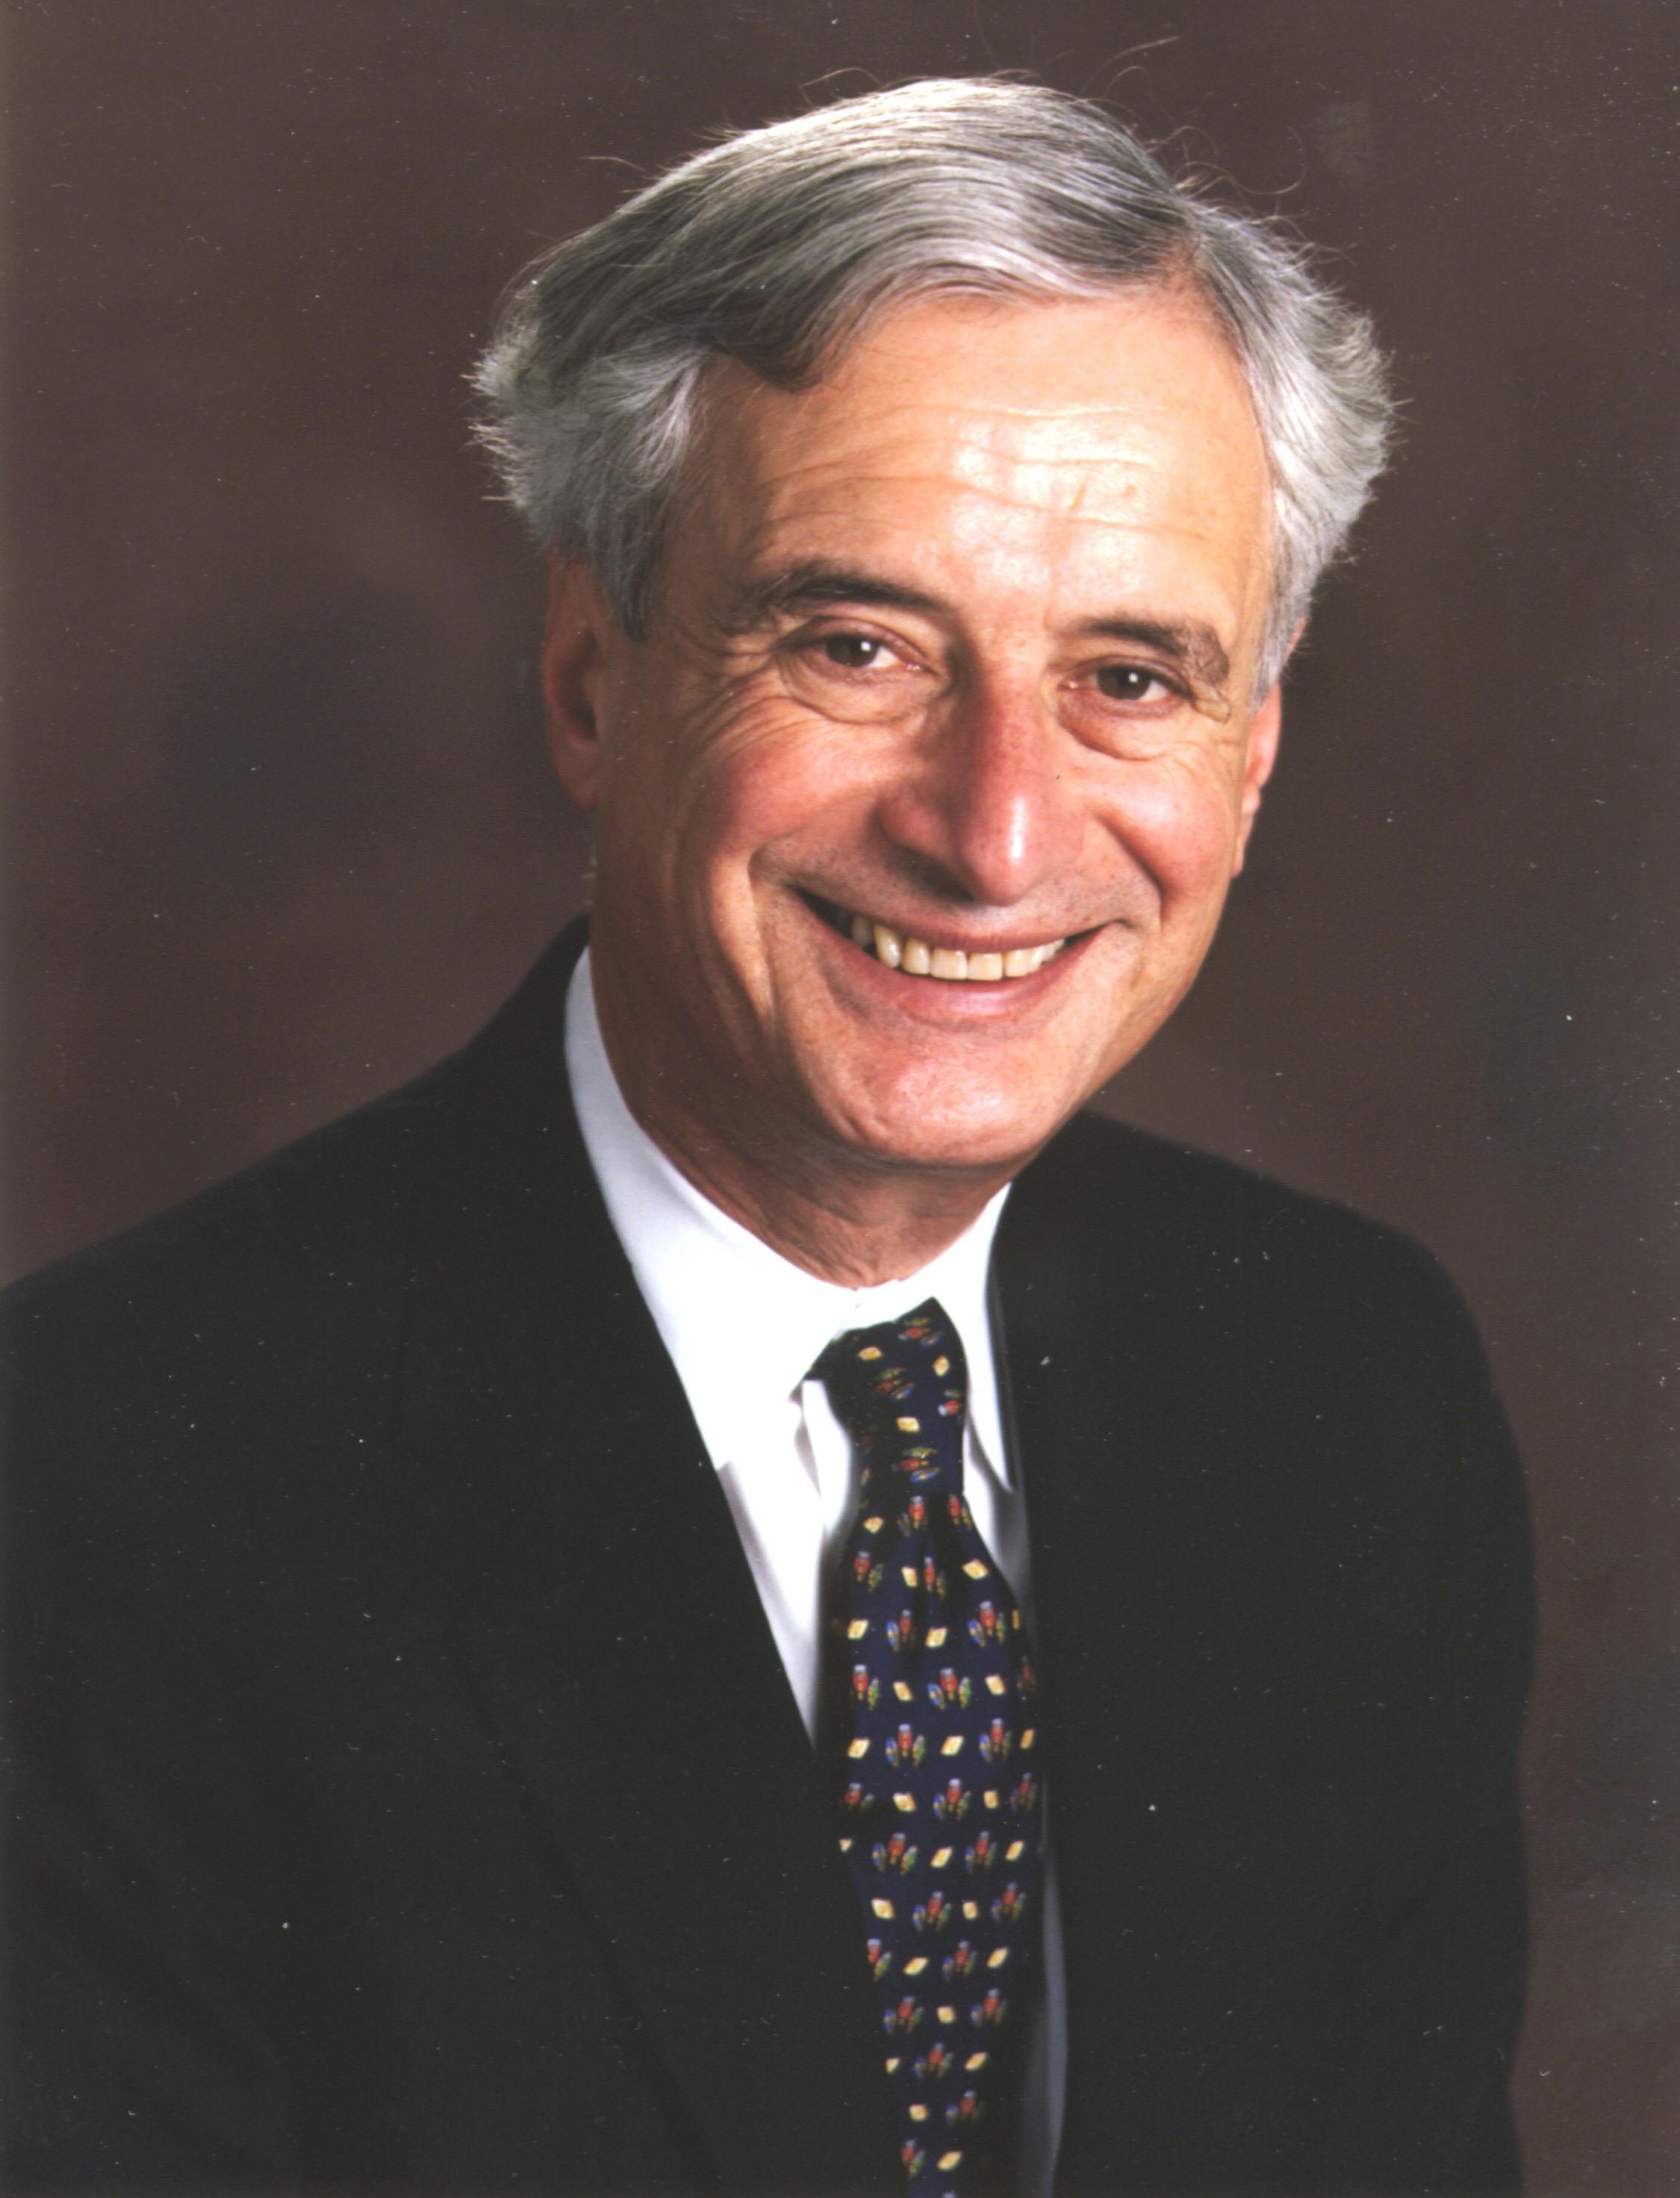 Robert Kaplan Net Worth